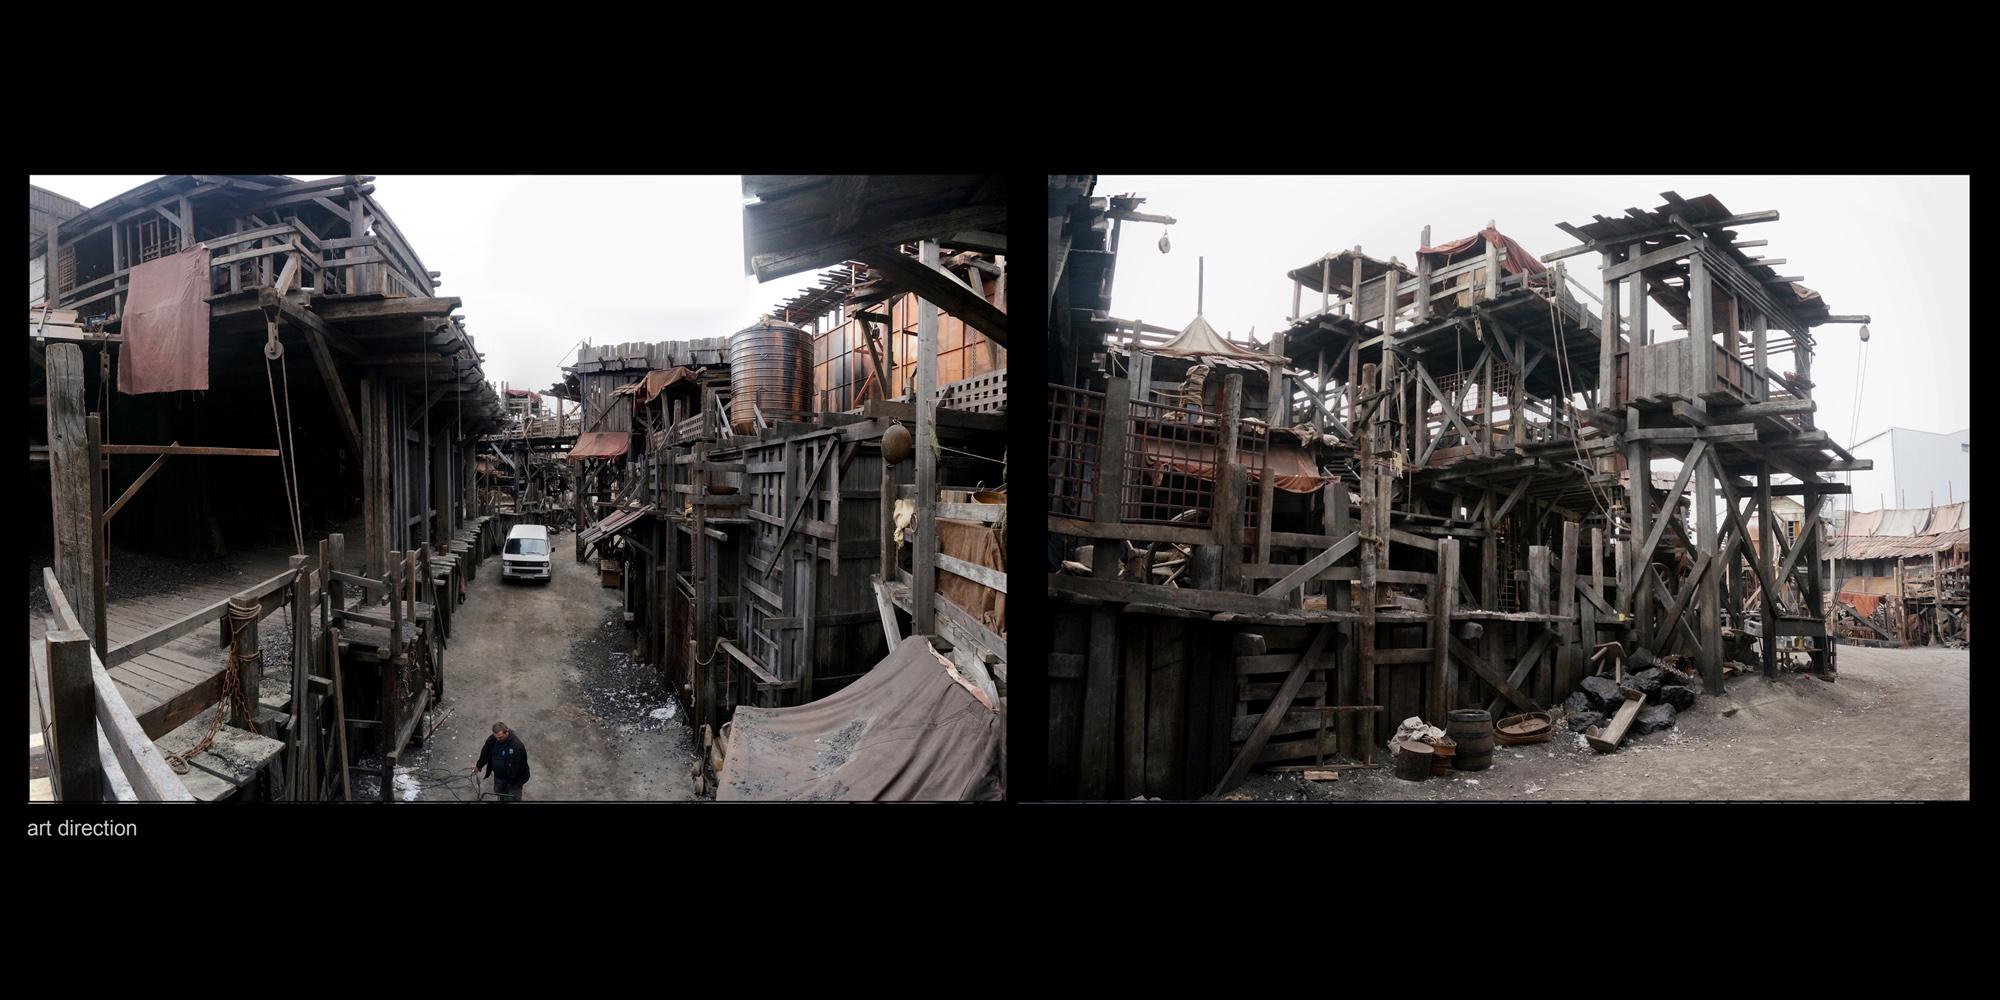 favela-07-extra -02.jpg